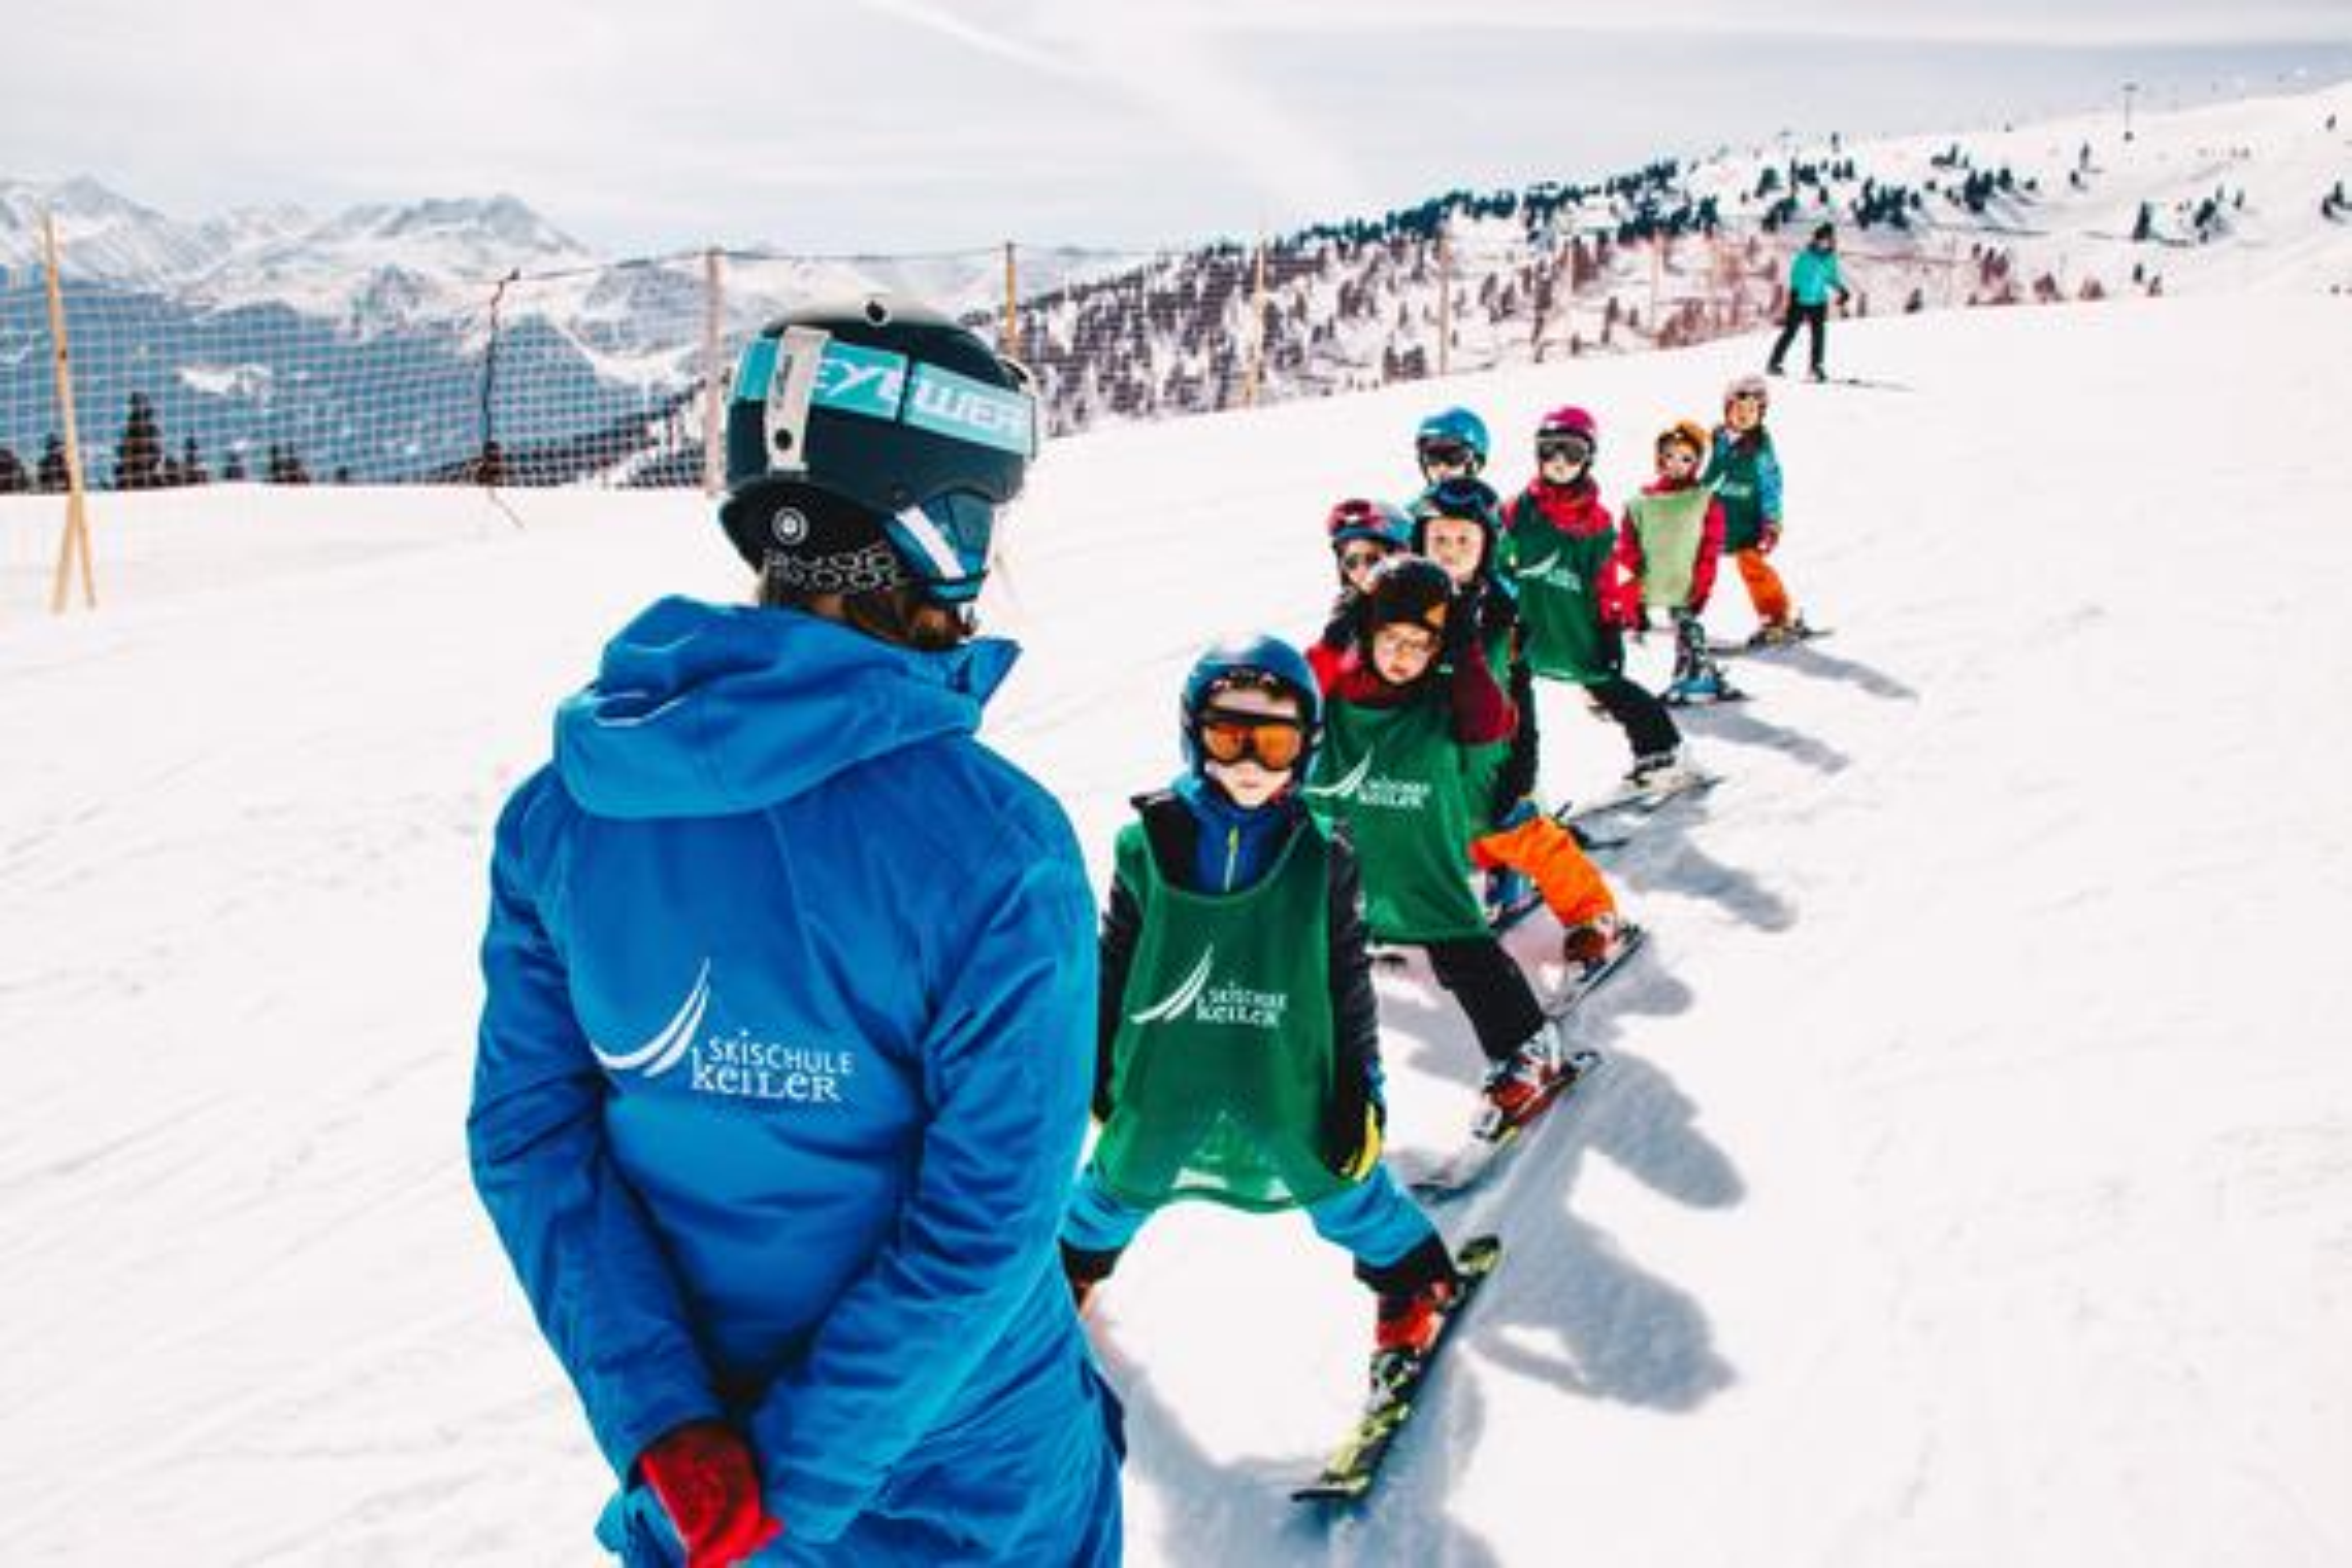 Ski Lessons for Kids (from 4 years) - Beginner